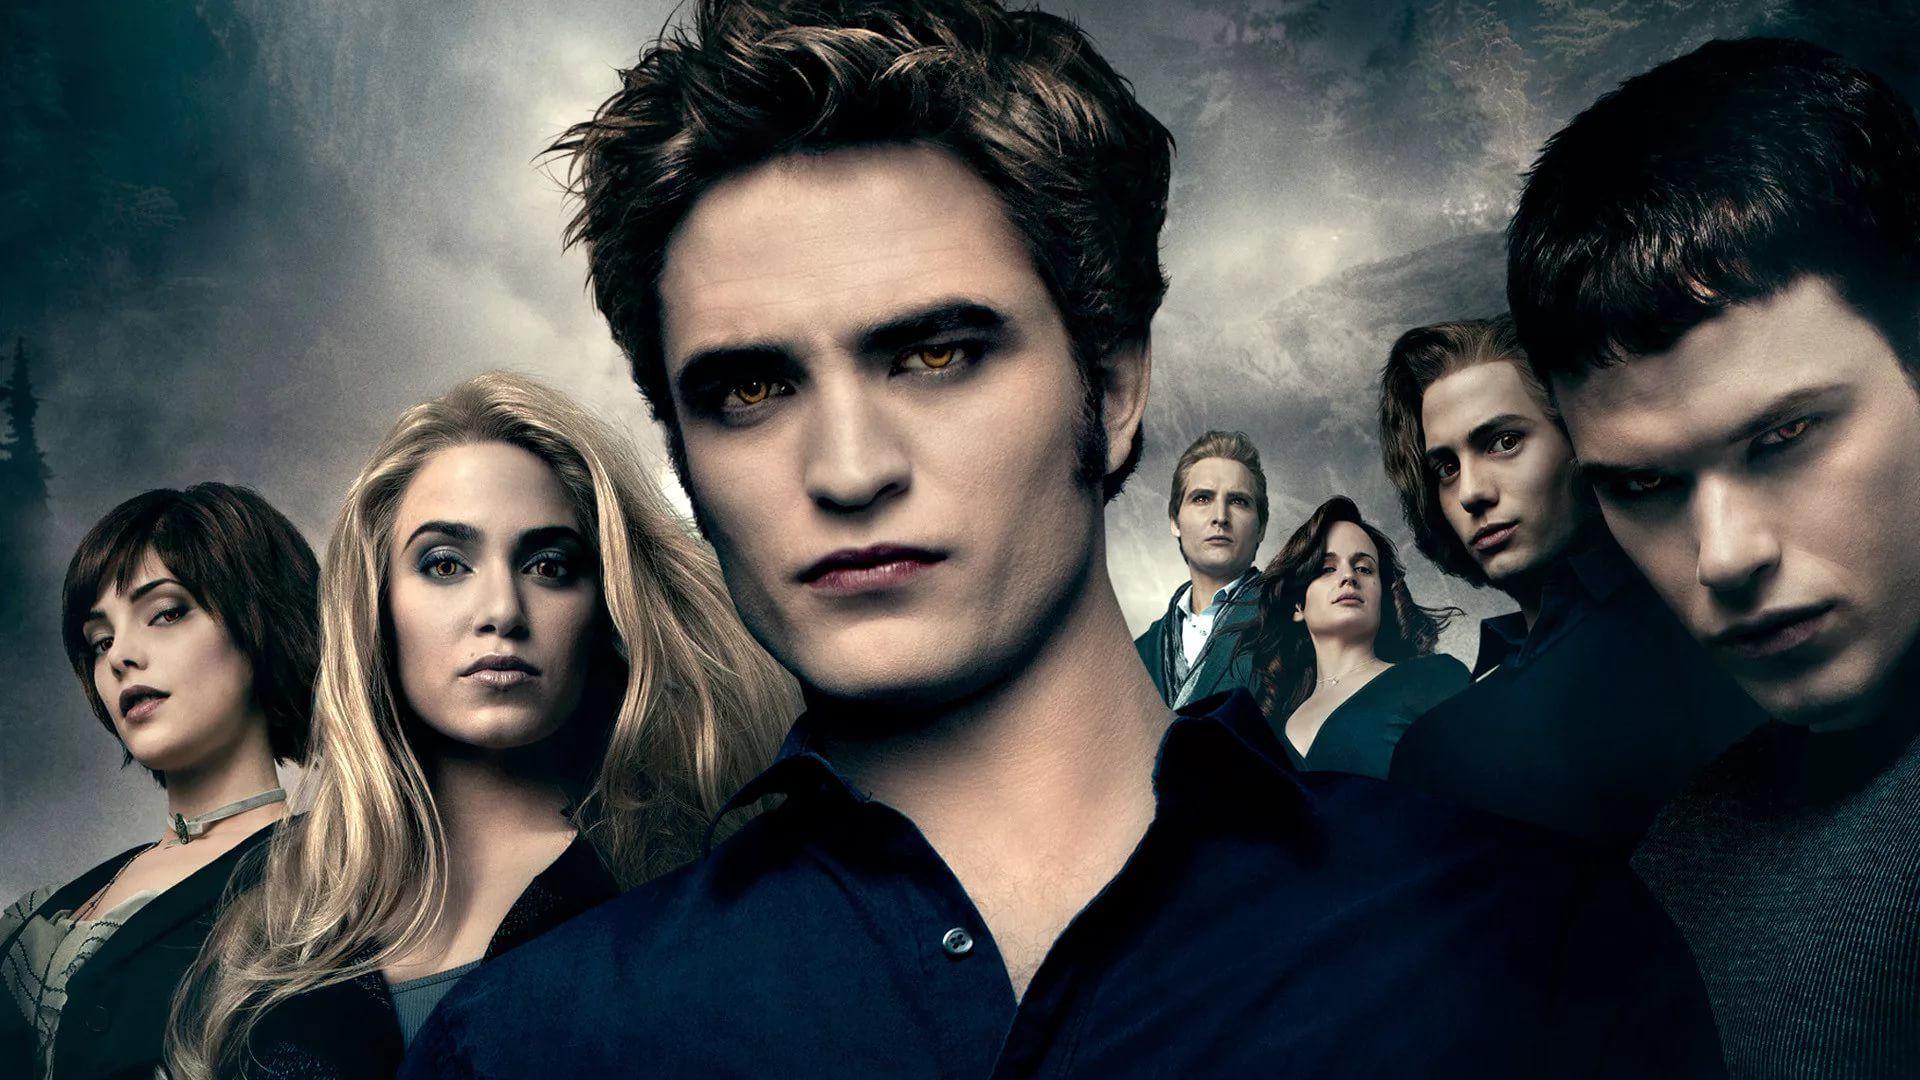 Twilight Saga Background